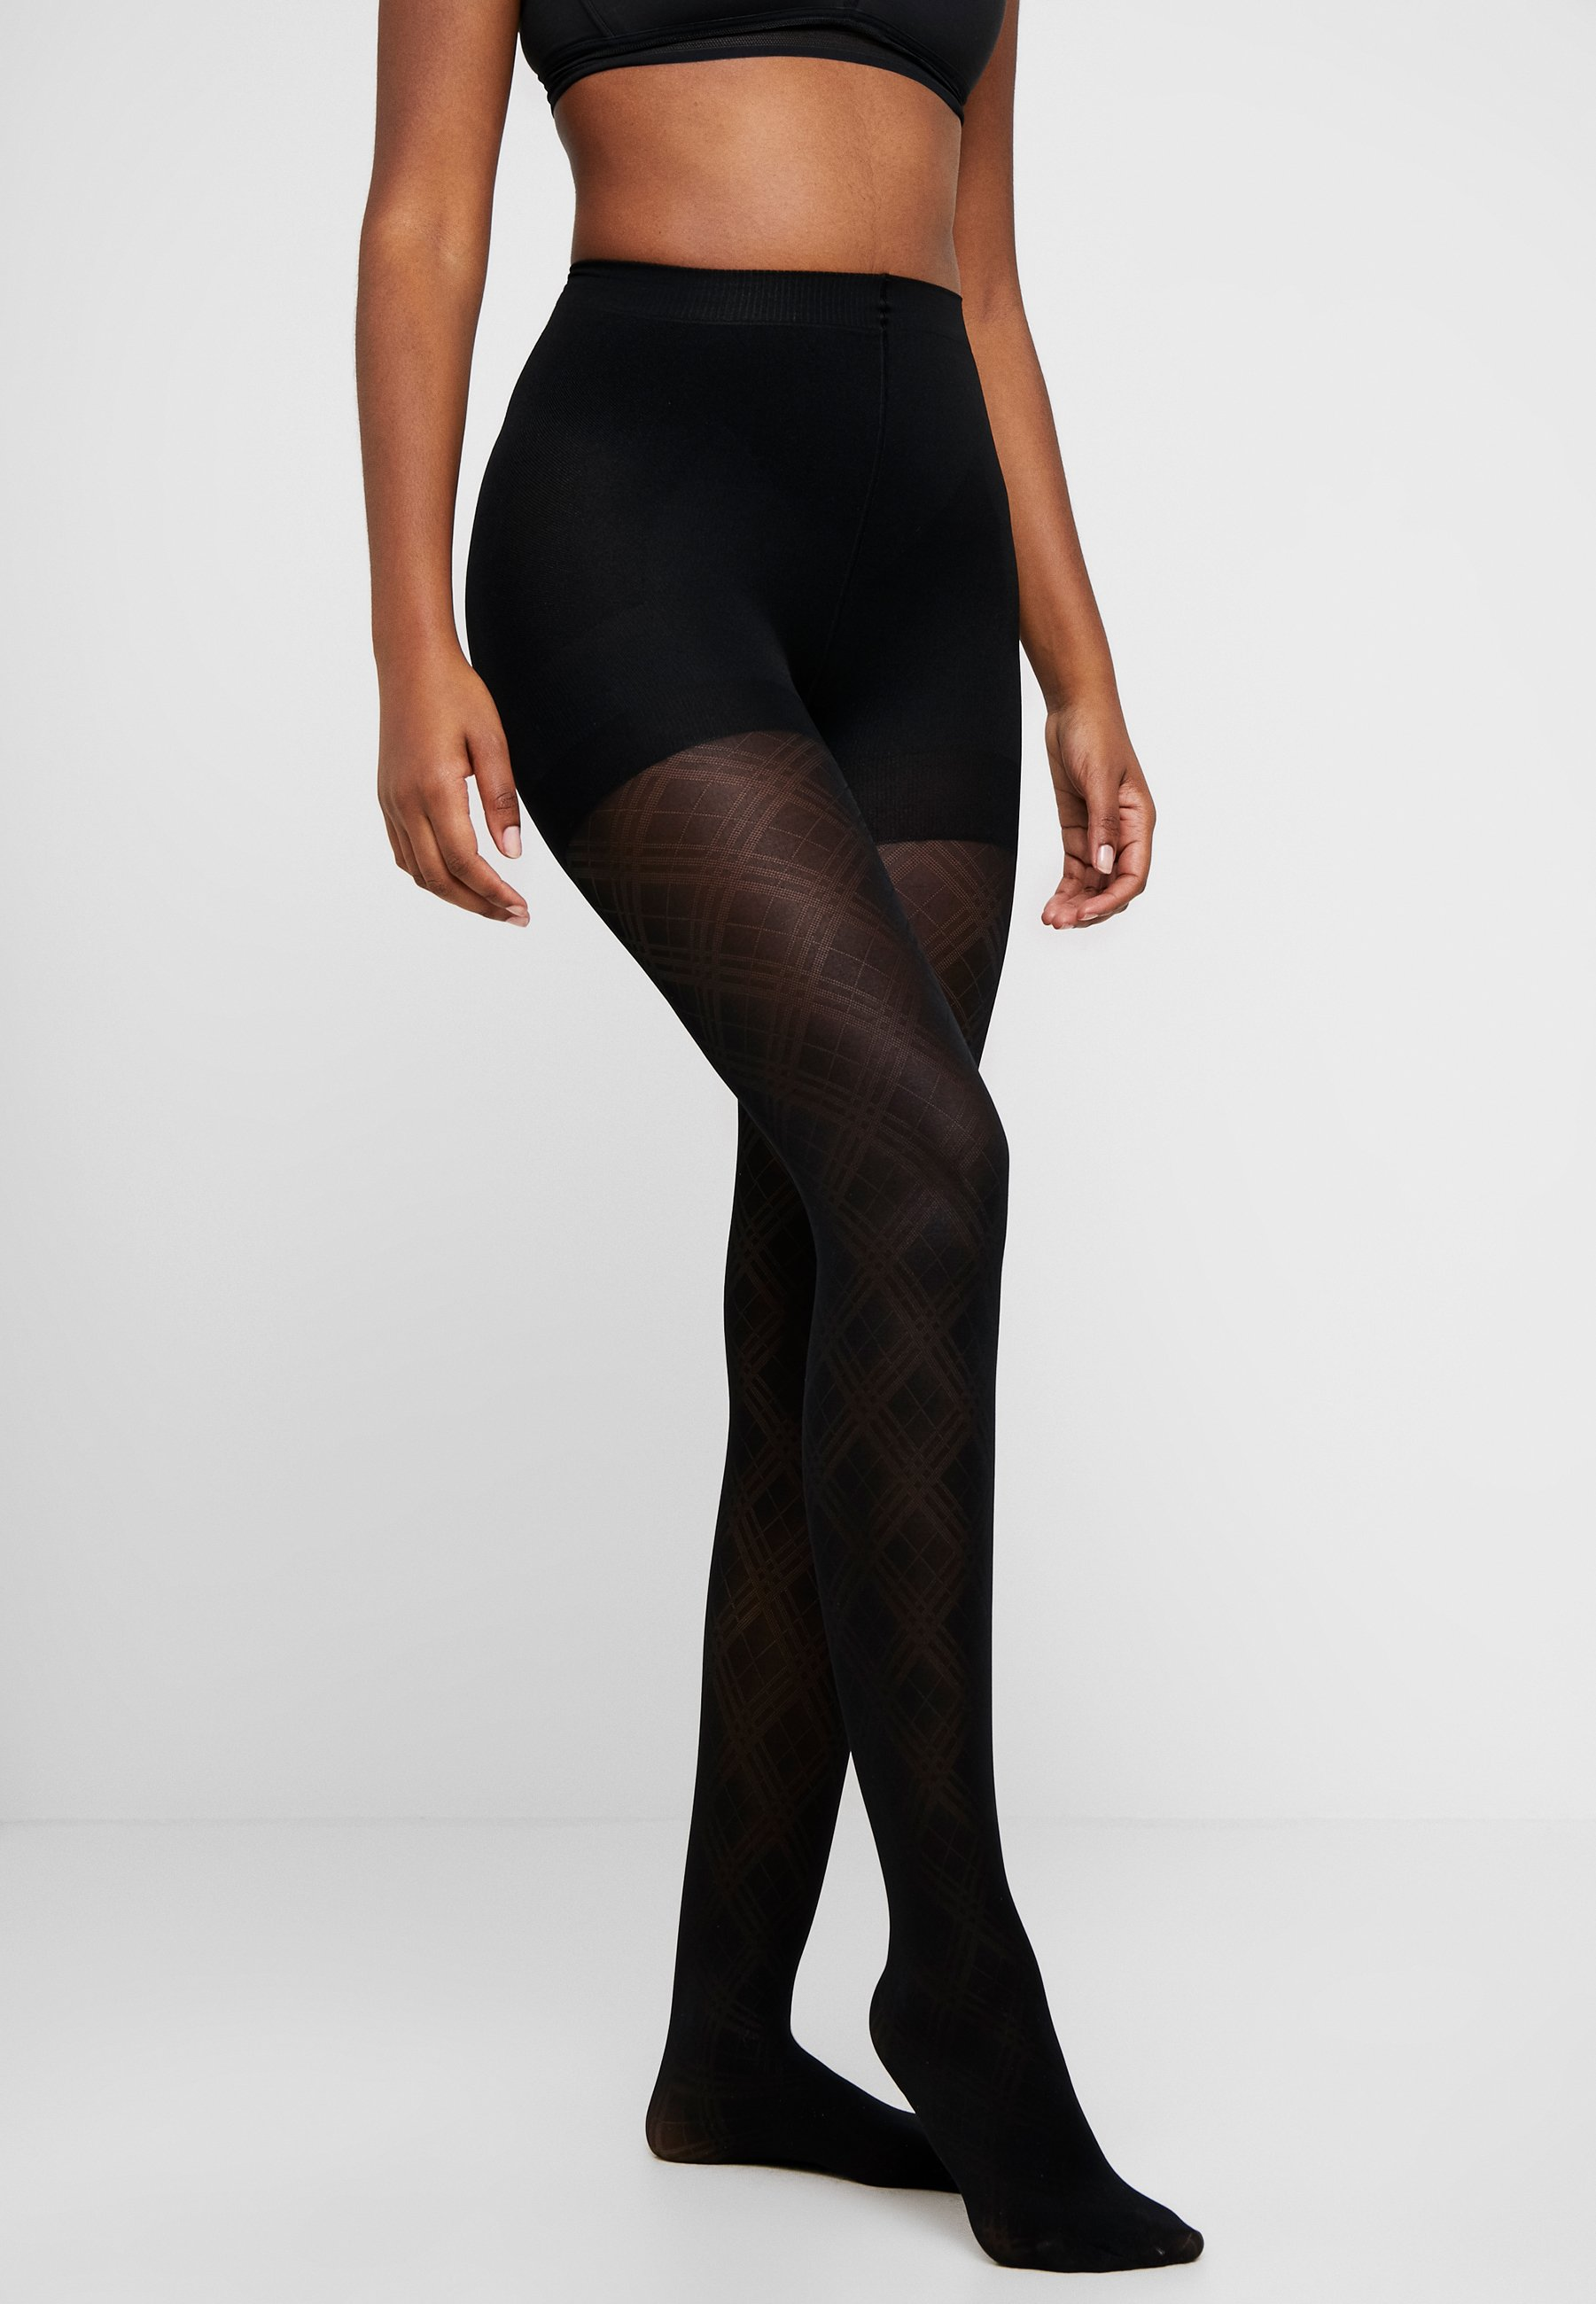 Femme INCREDIBLE LEGS - Collants